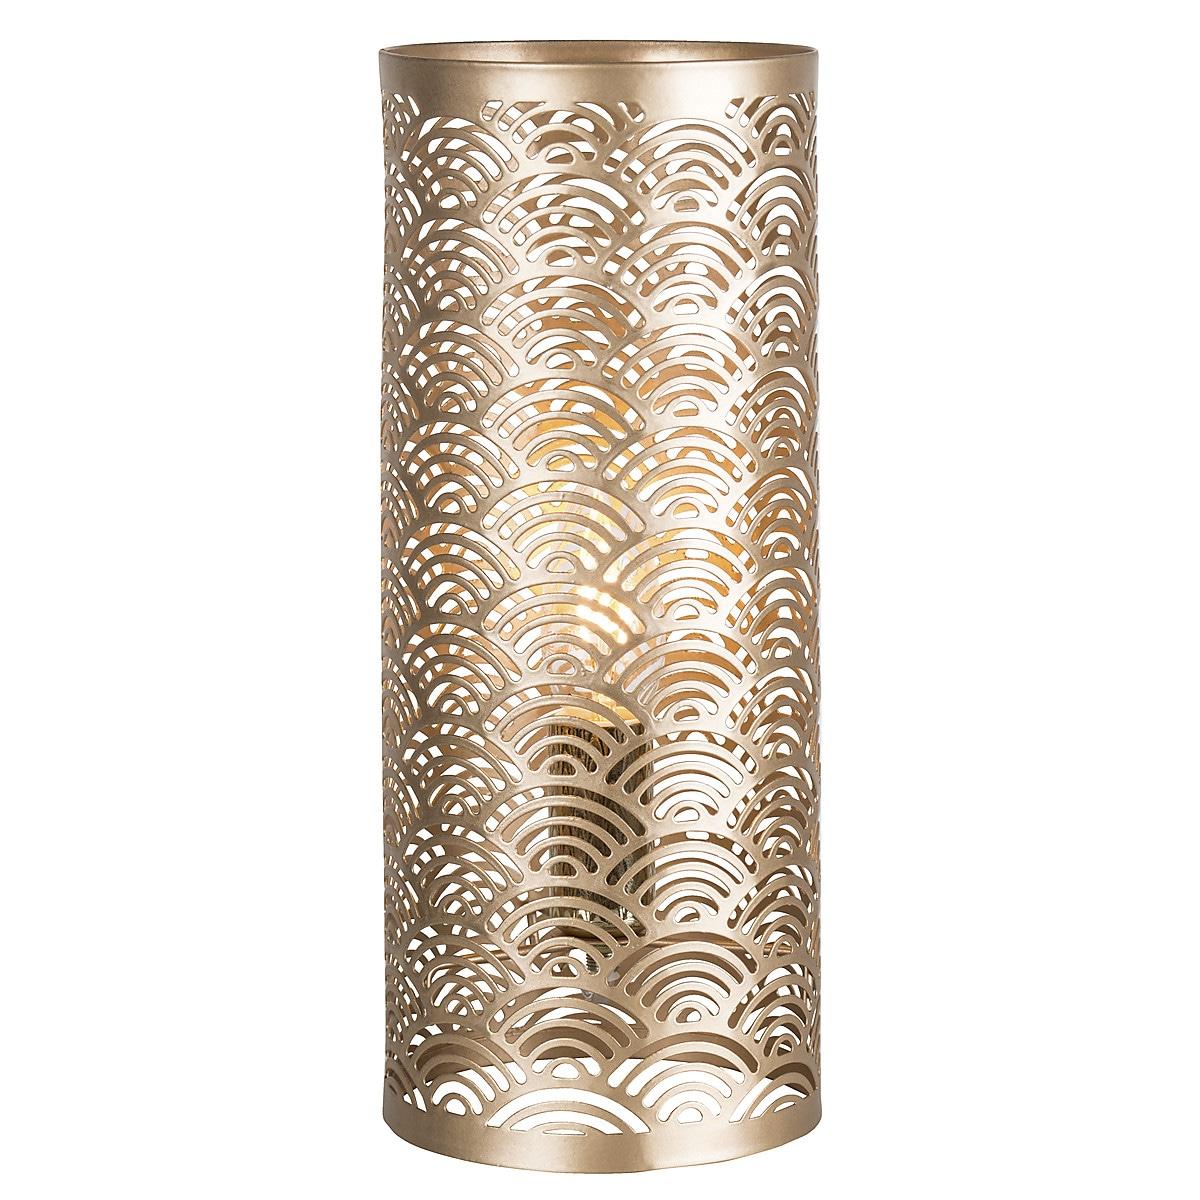 Bordslampa Bowie Globen Lighting